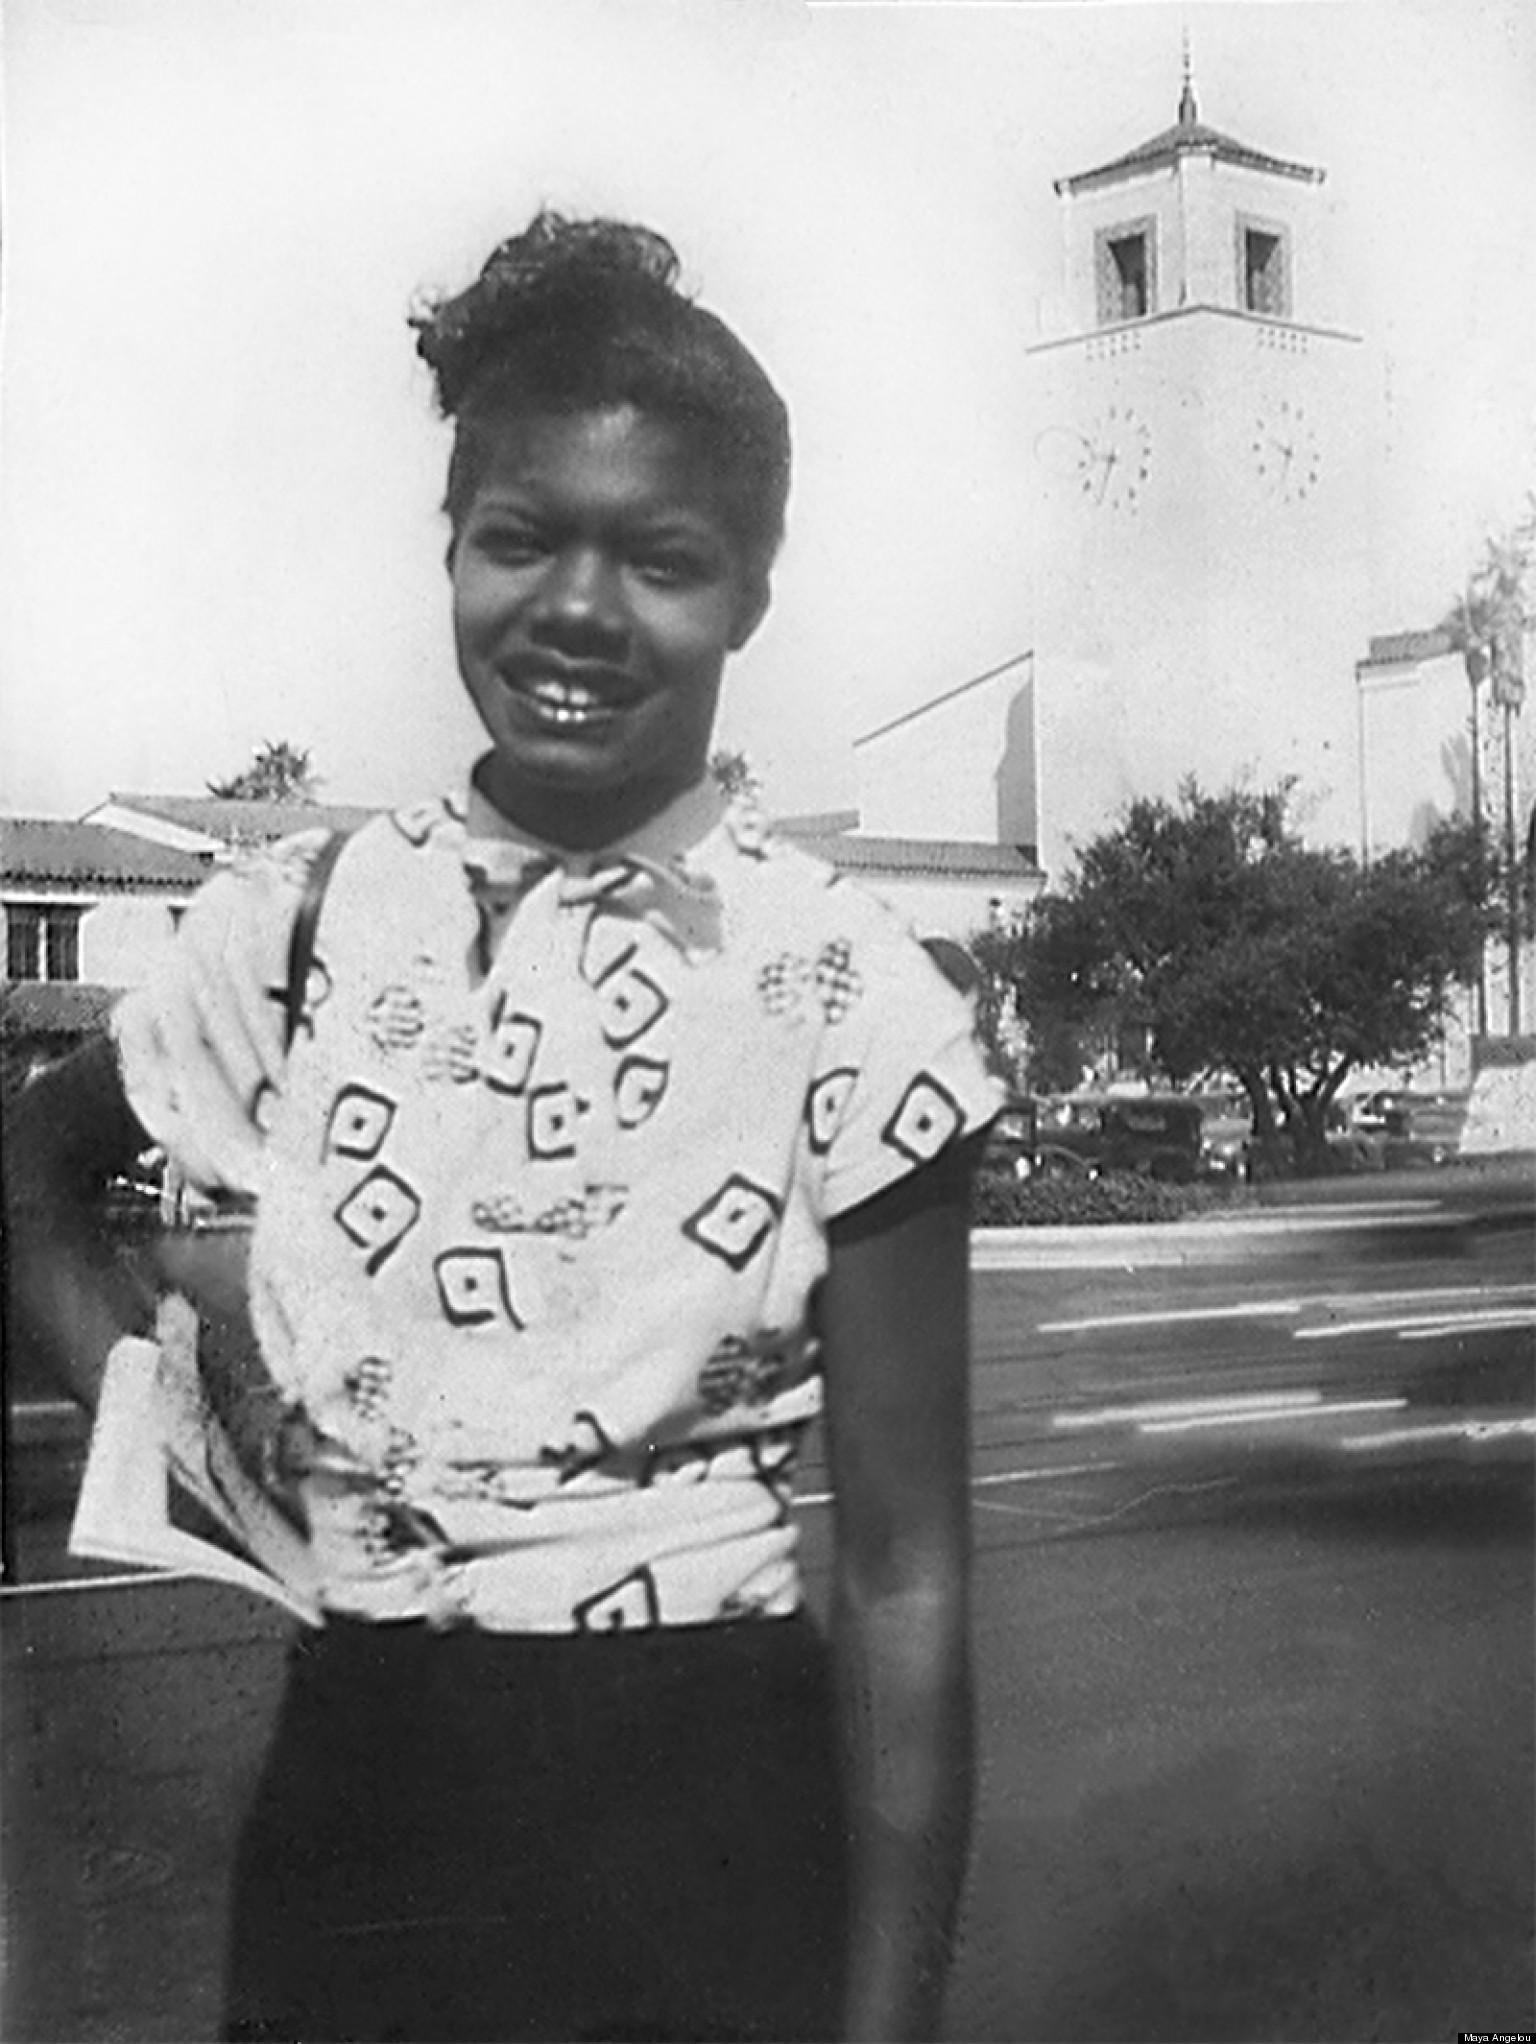 http://i.huffpost.com/gen/1134817/thumbs/o-MAYA-ANGELOU-SAN-FRANCISCO-FIRST-BLACK-STREETCAR-facebook.jpg